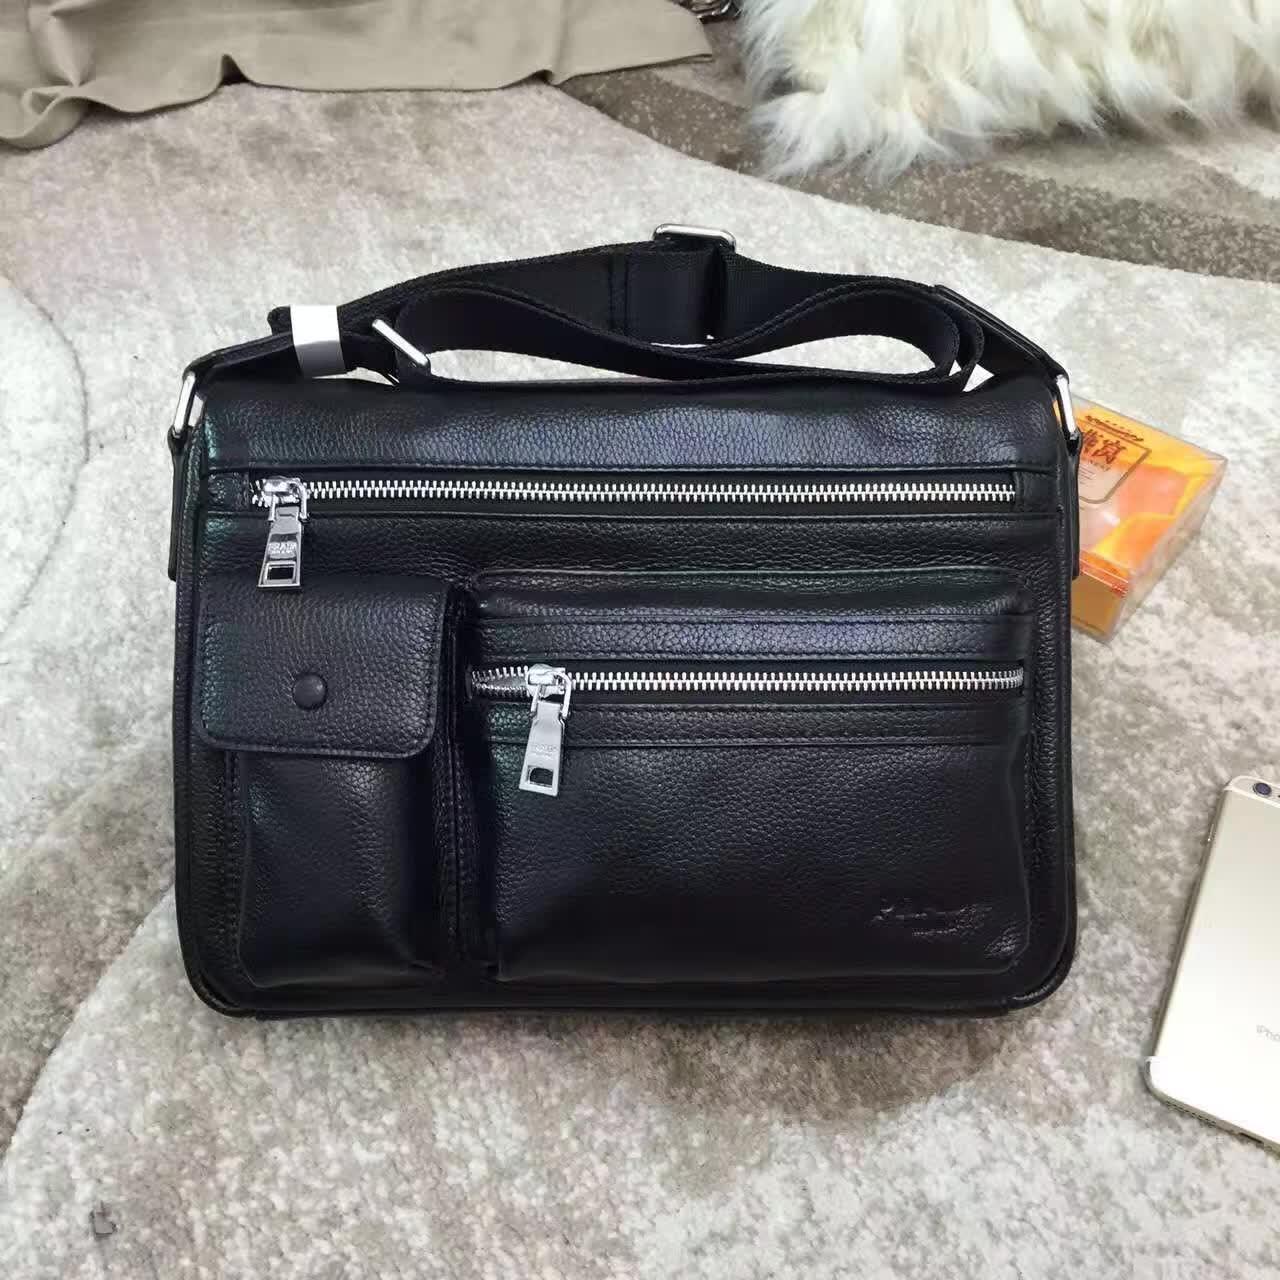 Prada 0228-3 Leather Men Clutch Messenger Bag Black